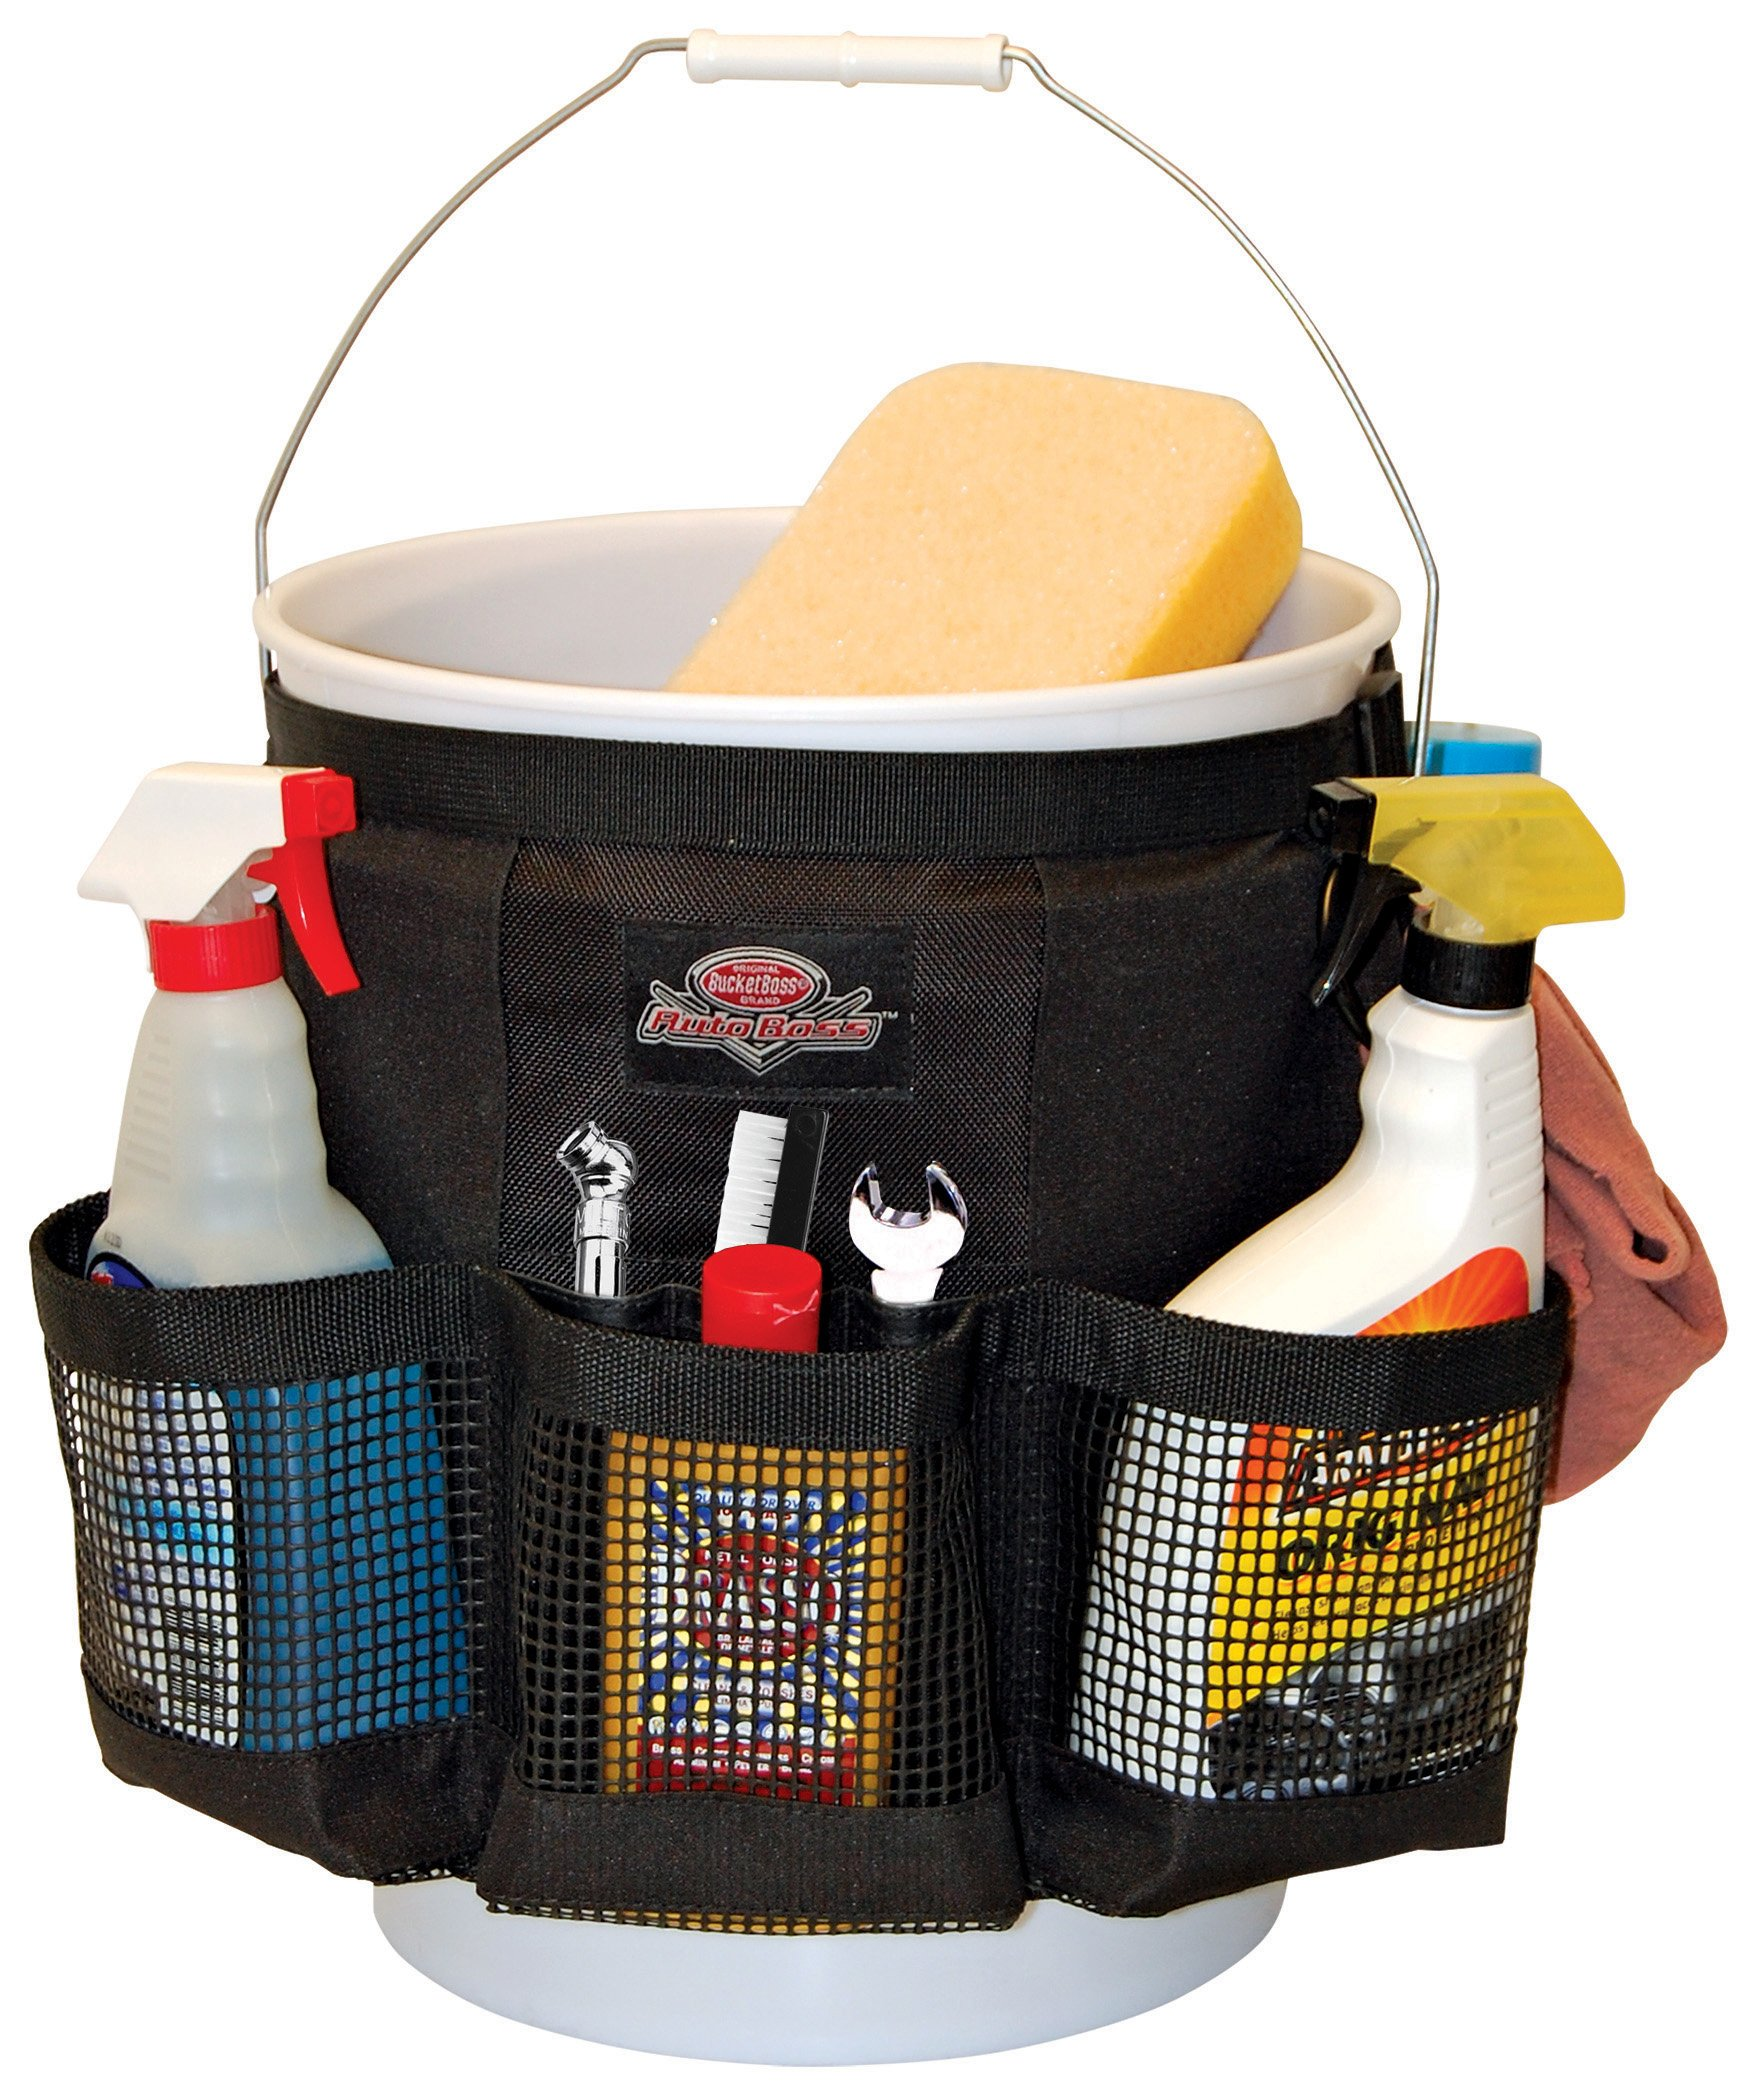 Bucket Boss AB30060 Wash Organizer